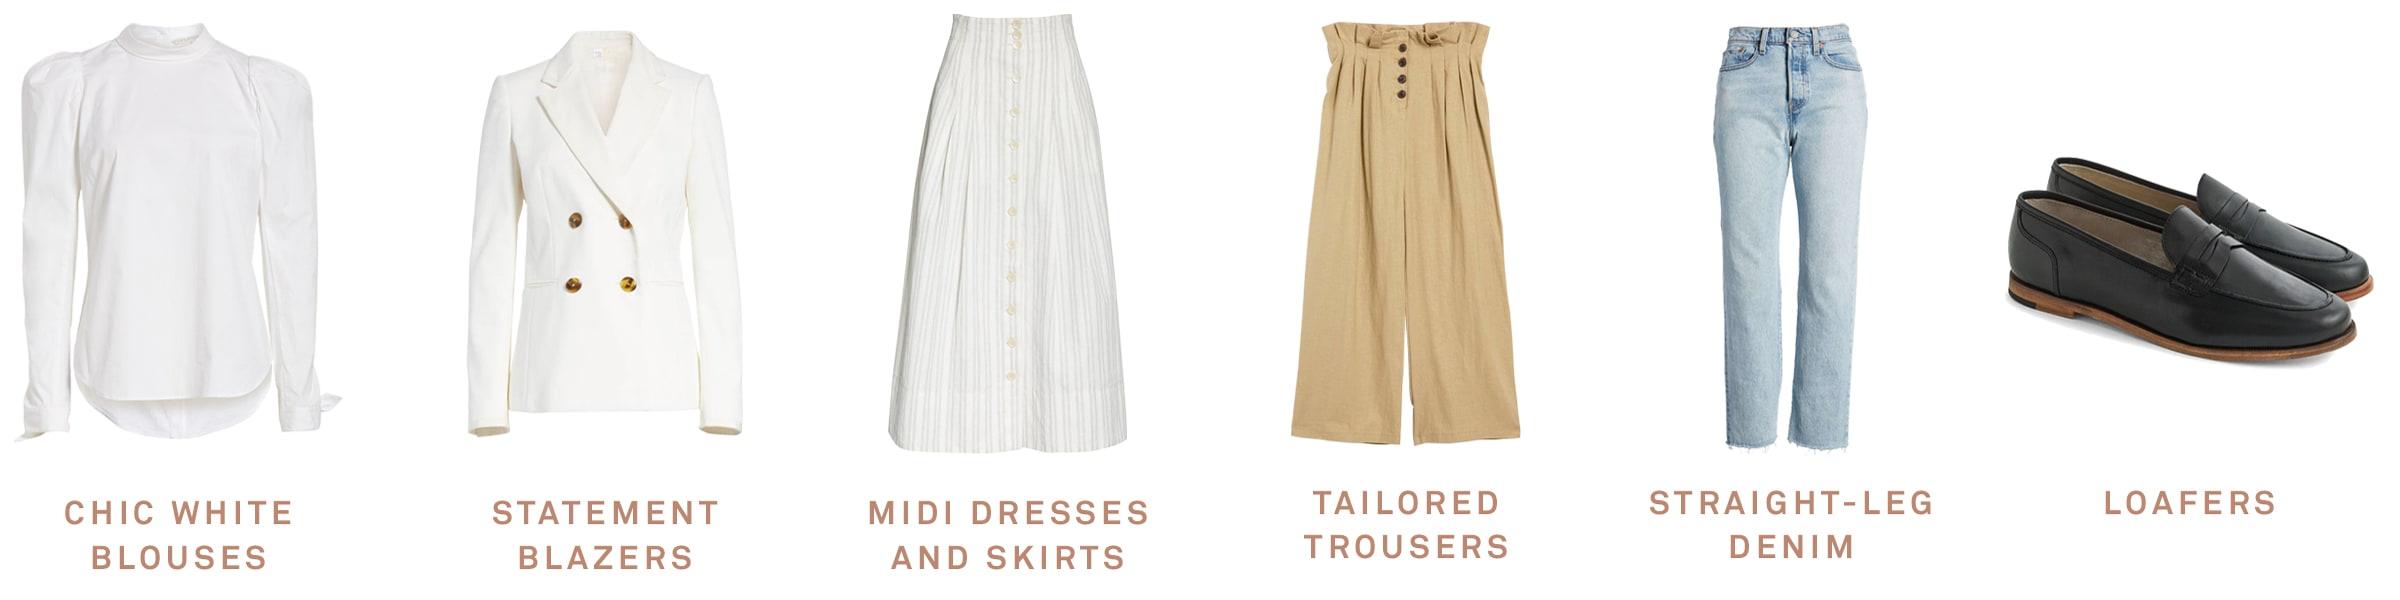 Mary Orton's six wardrobe essentials